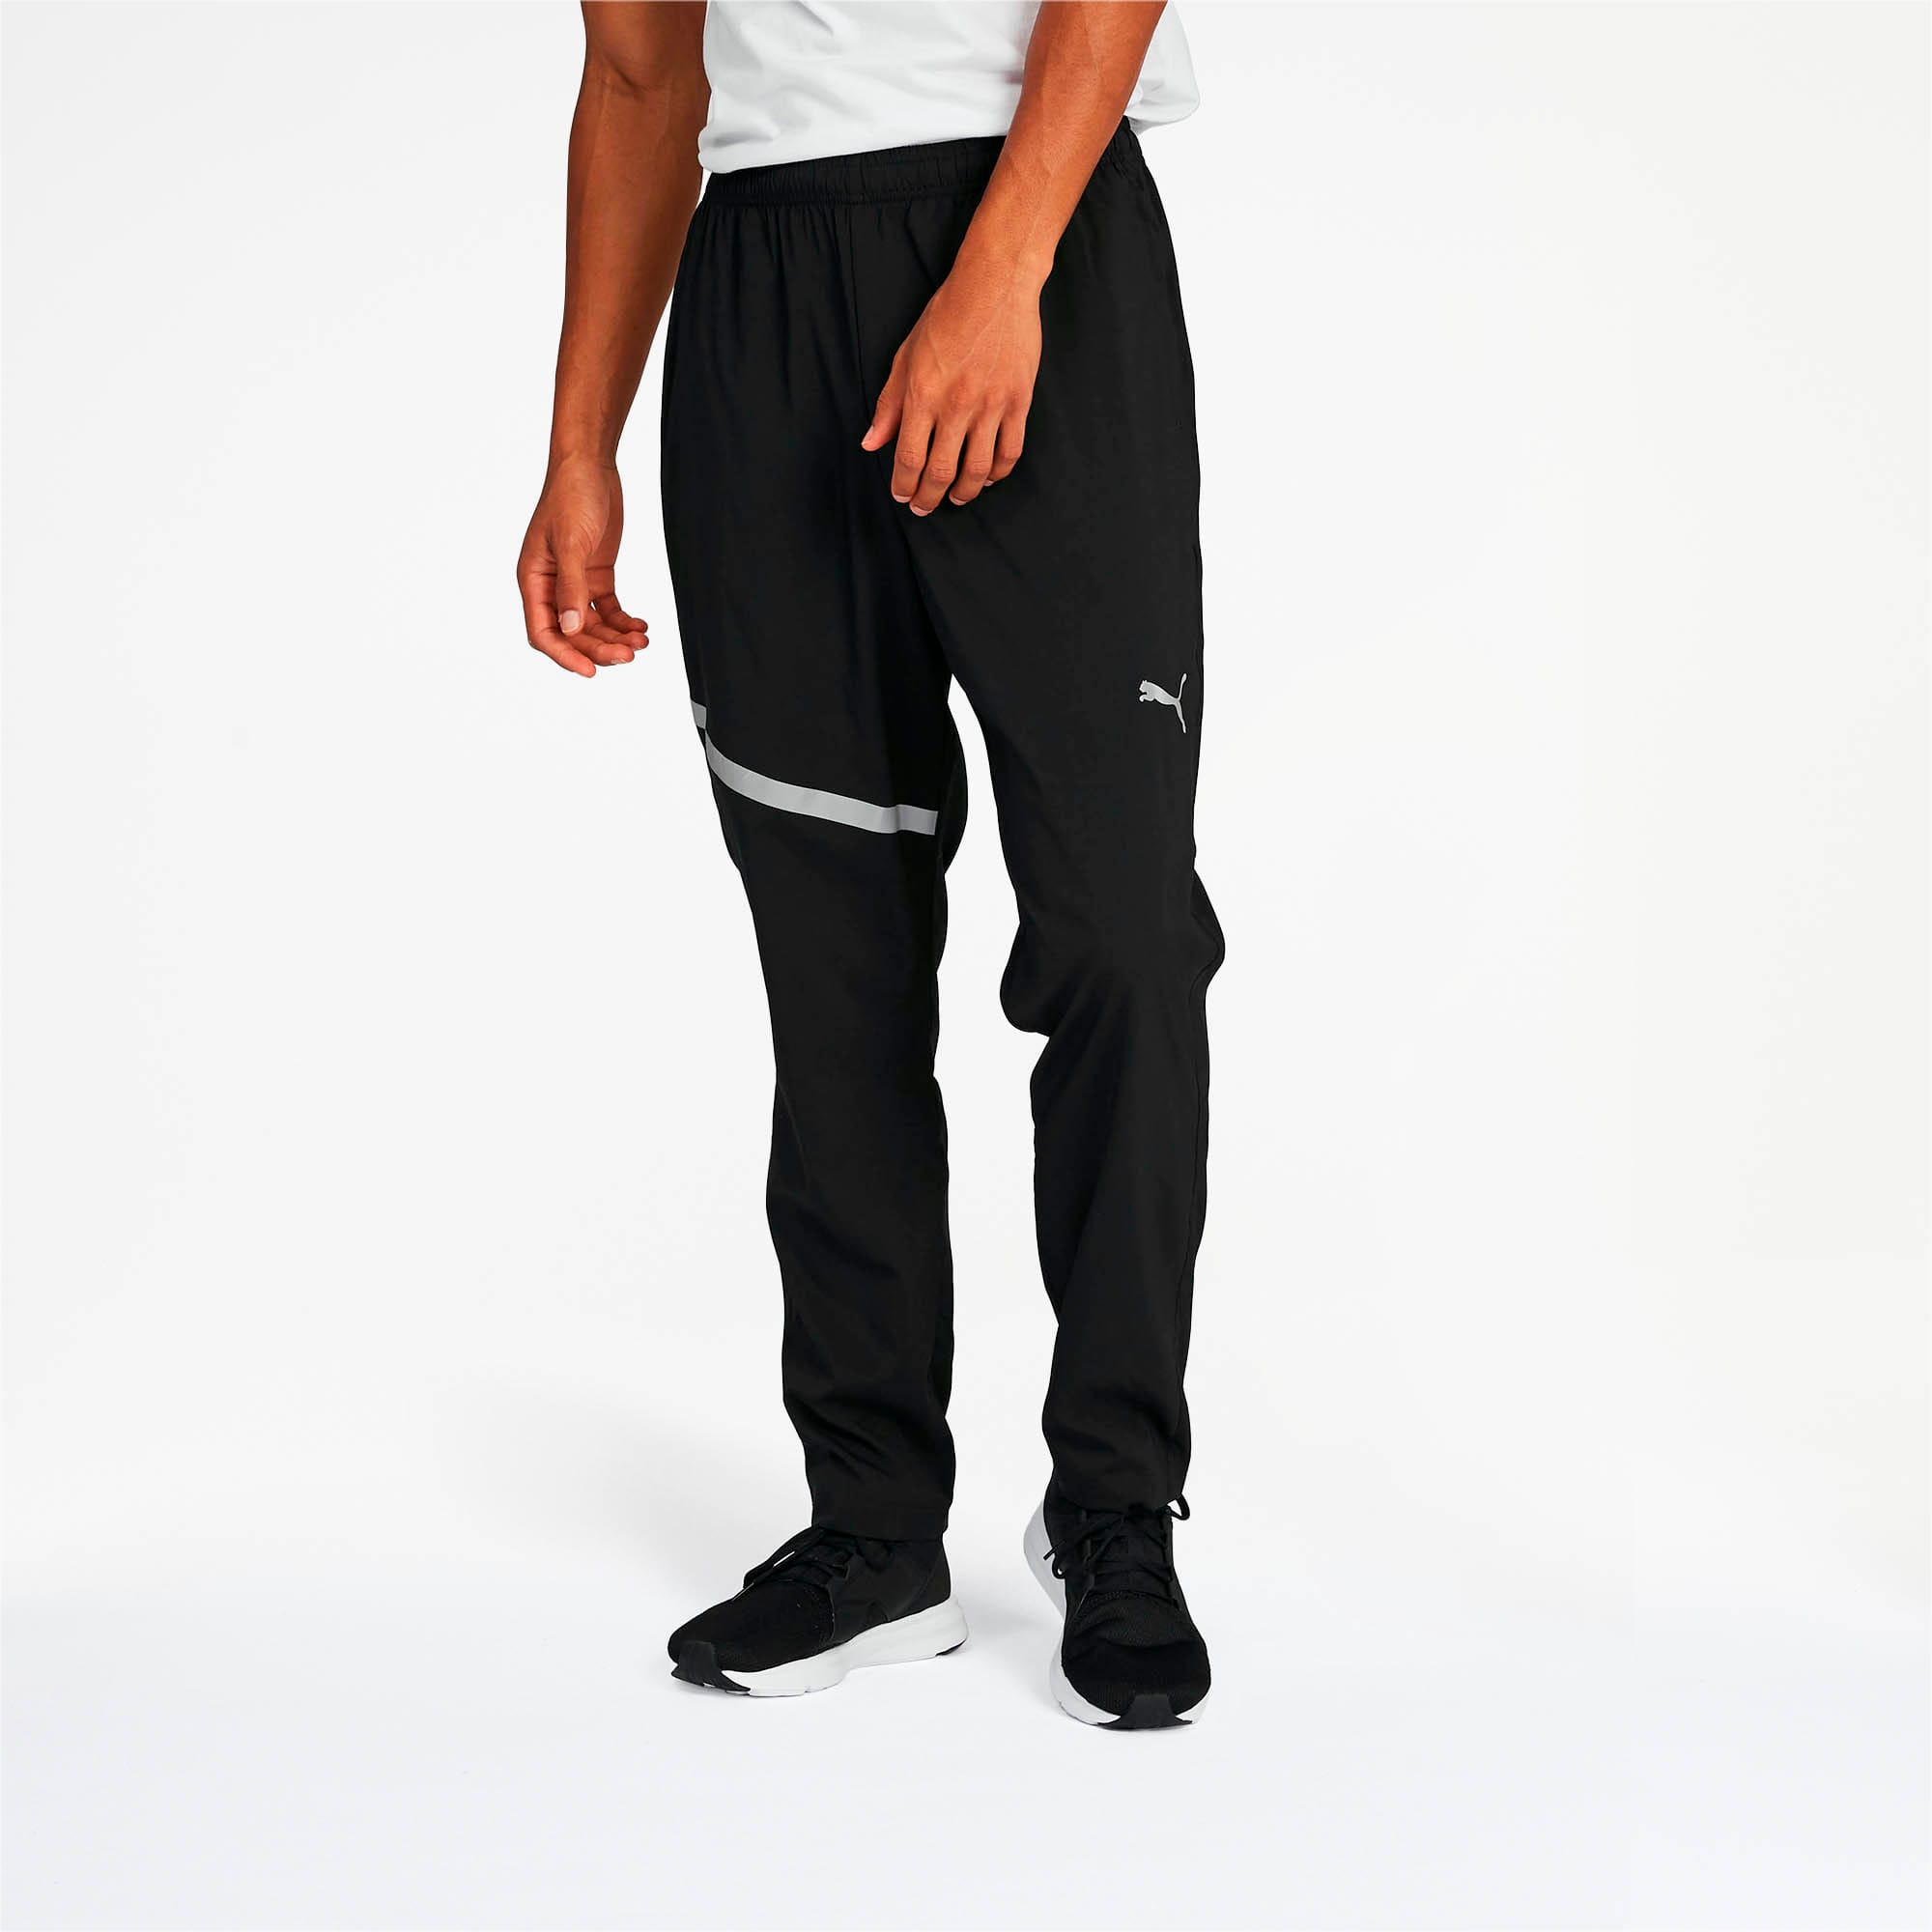 Thumbnail 1 of Ignite Woven Pants, Puma Black, medium